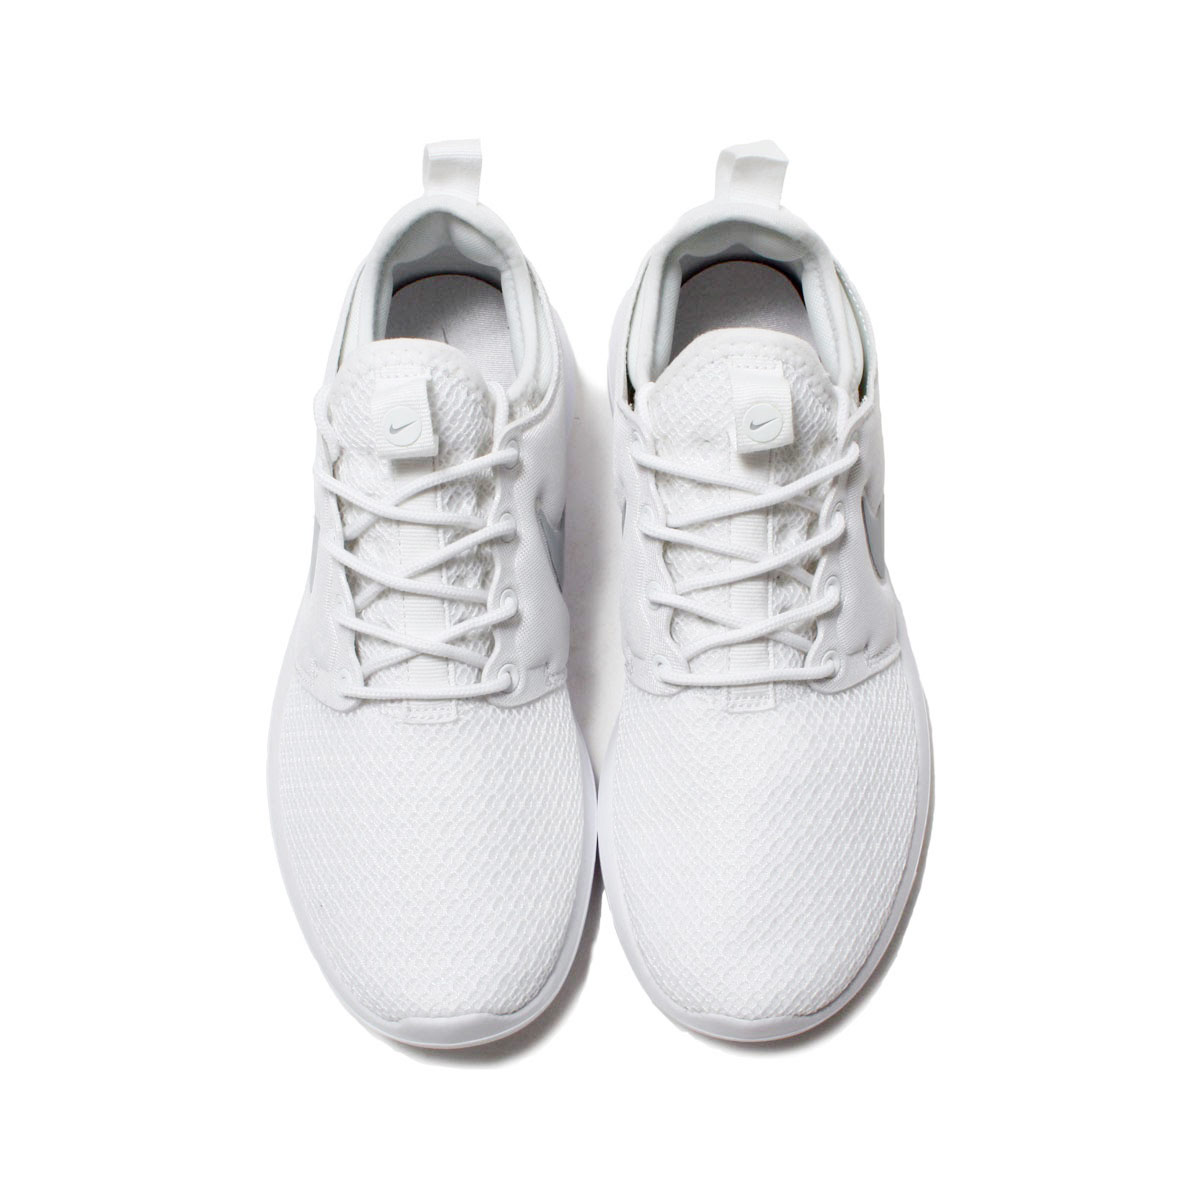 5fe0c32915a51 NIKE W ROSHE TWO (ナイキウィメンズローシ 2) WHITE WHITE-WOLF GREY 17FA-I